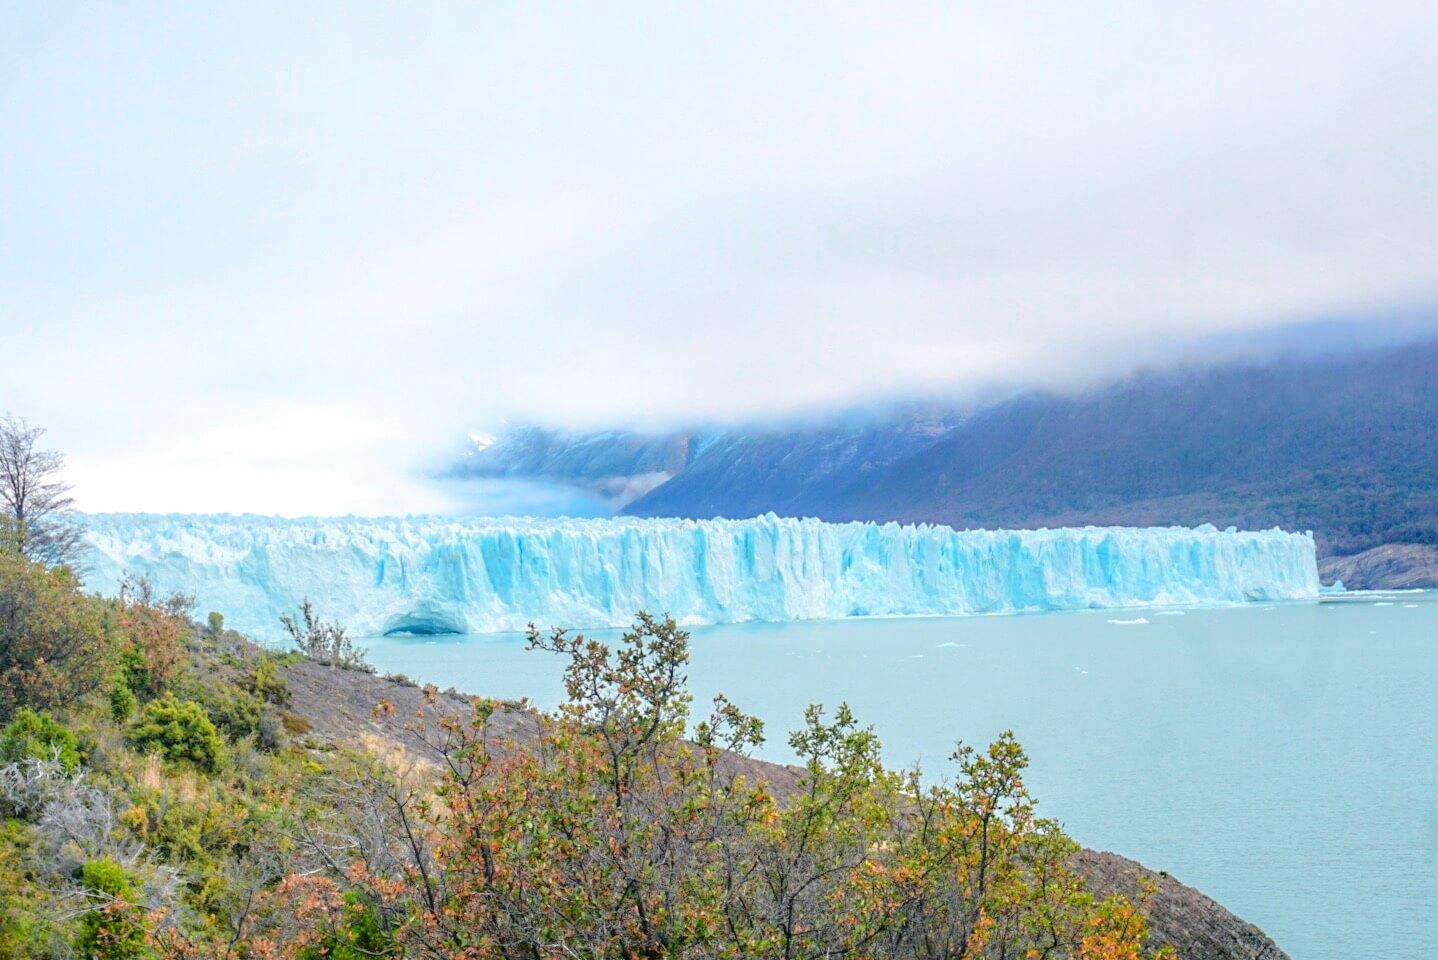 glacier périto moreno argentine